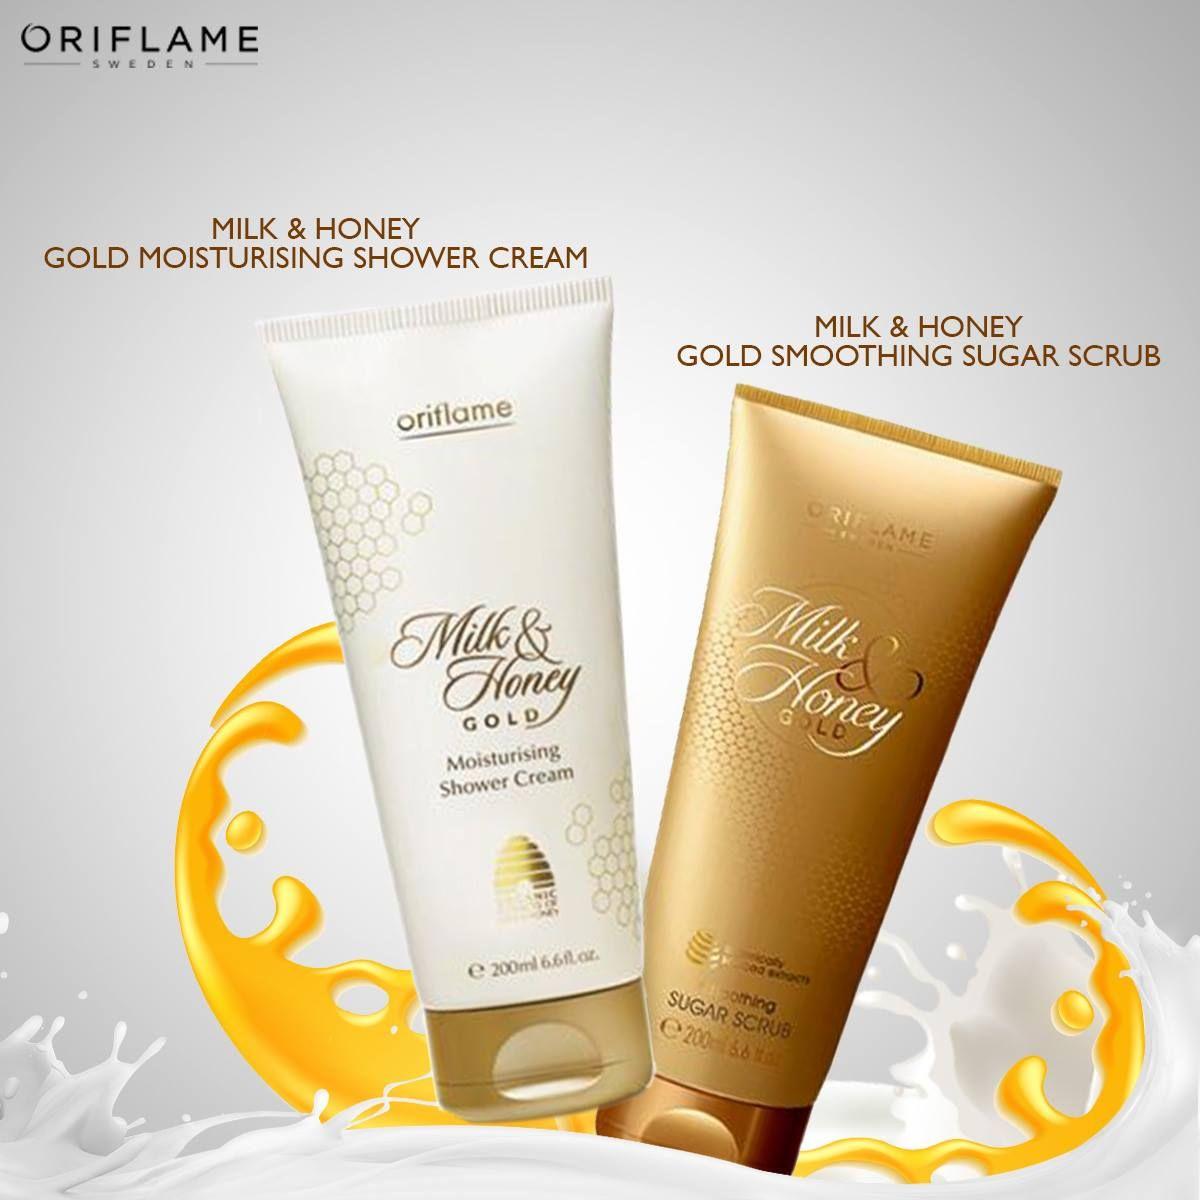 Cleanse Exfoliate And Smoothen Your Skin Try Oriflames Milk Parfum Putri Honey Gold Moisturising Shower Cream Smoothing Sugar Scrub For Best Natural